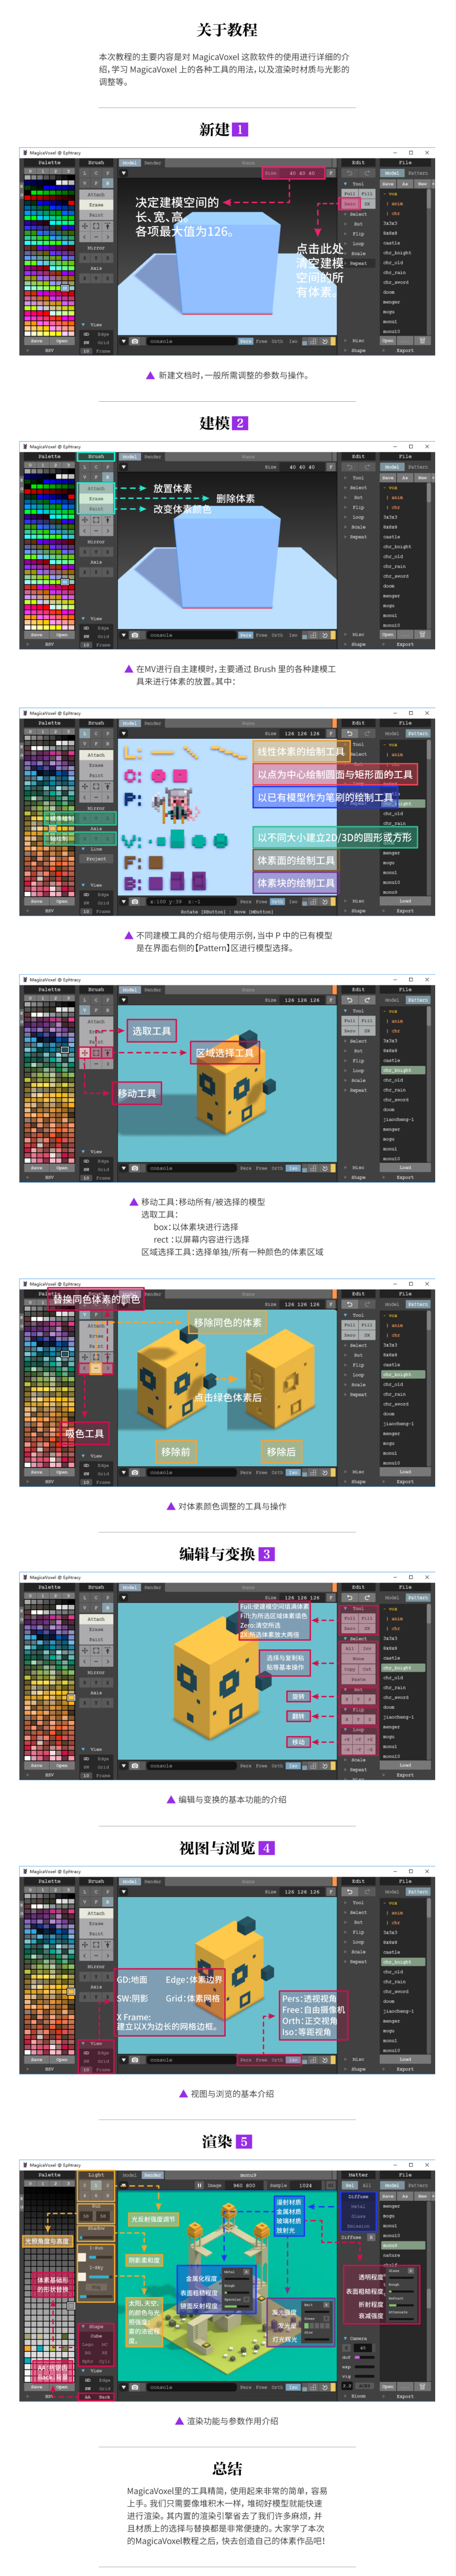 MagicaVoxel for Mac v0.99.4.2 像搭积木一样做3D场景-马克喵